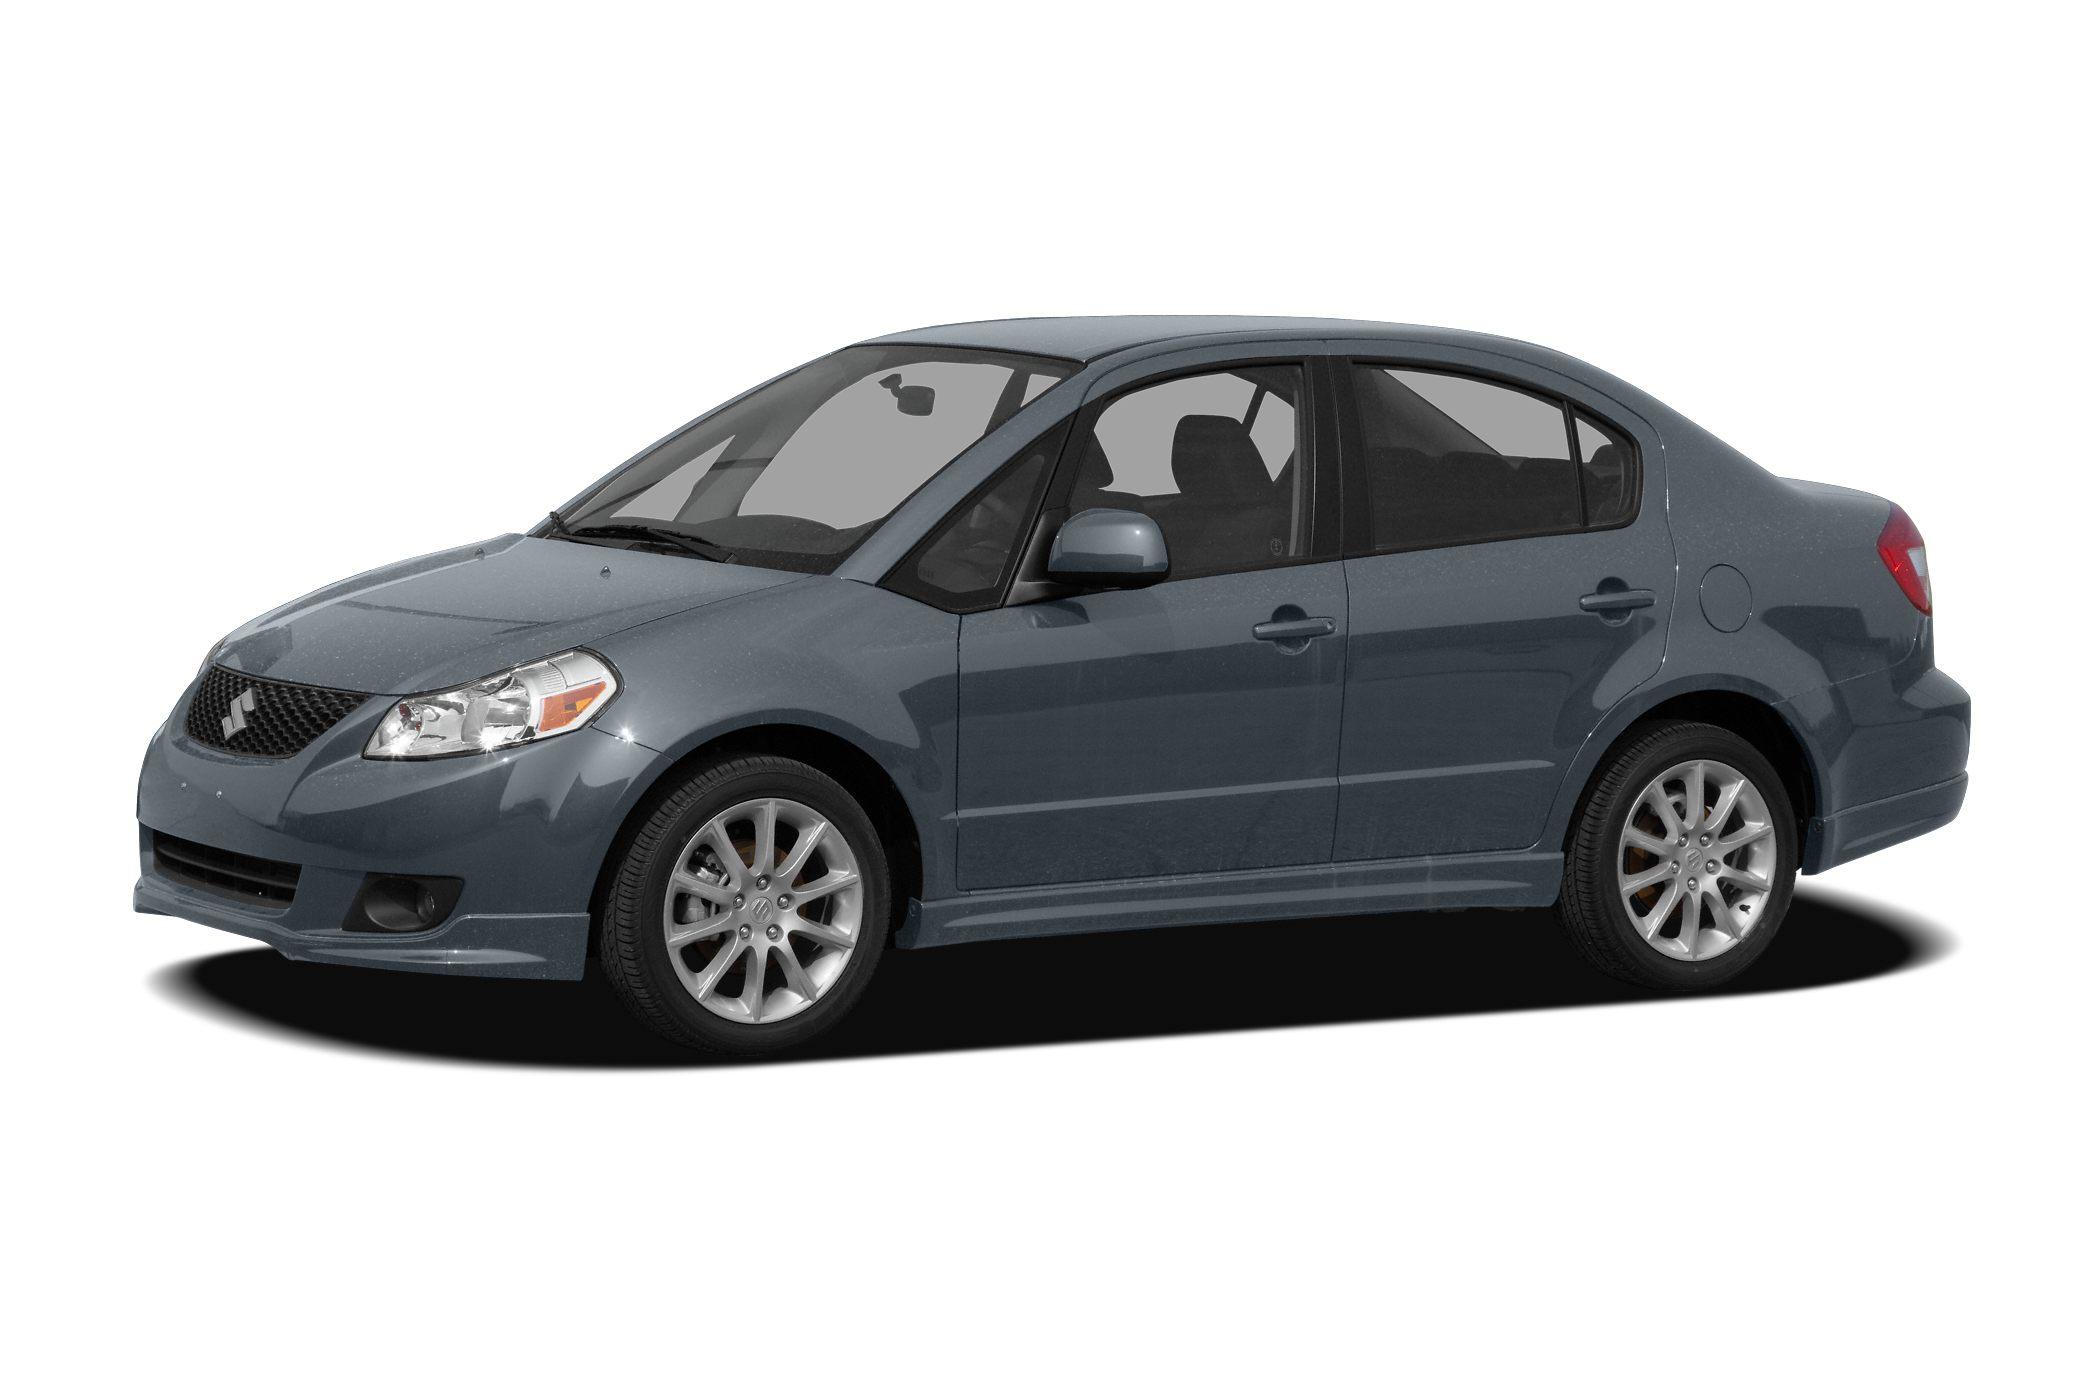 2009 Suzuki SX4  Miles 145550Color Black Stock 42508A VIN JS2YC414196201618